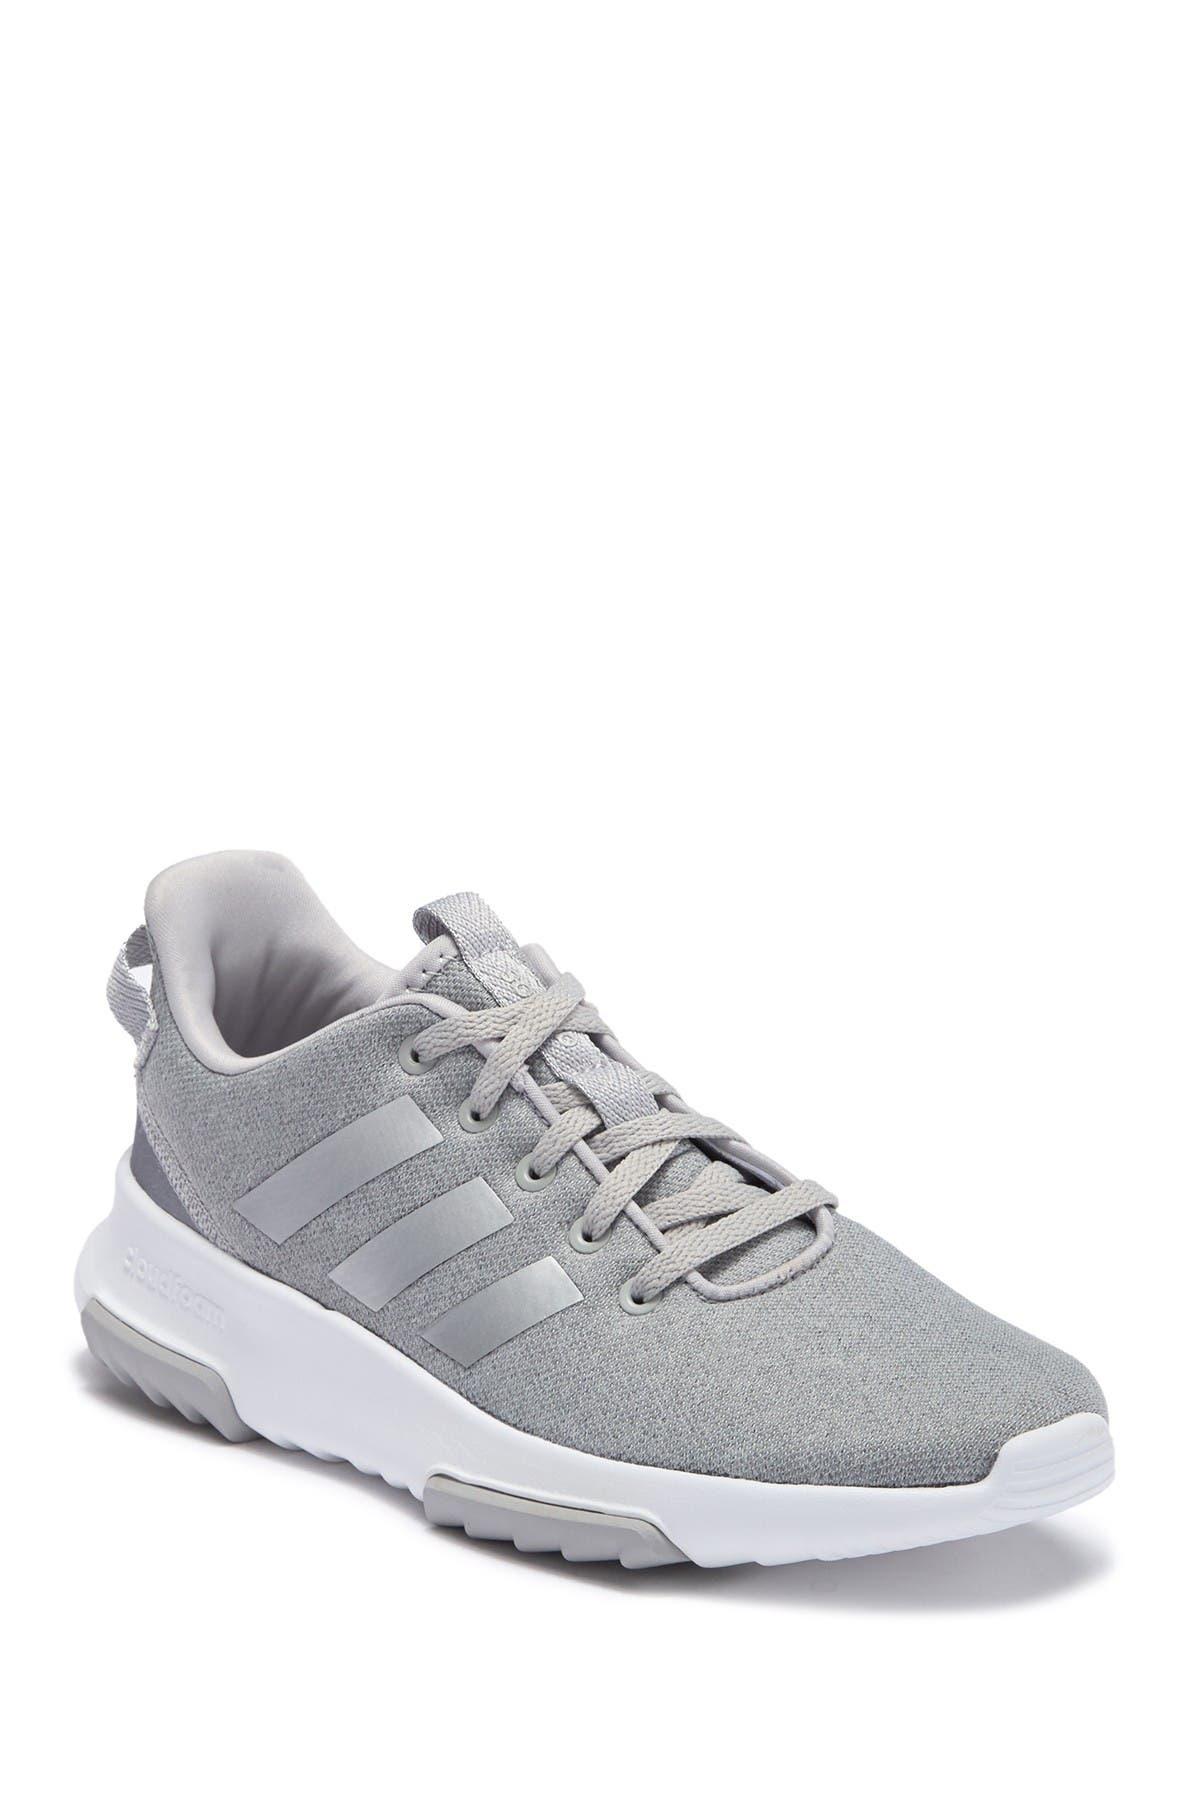 adidas   CloudFoam Racer Athletic Sneaker   HauteLook